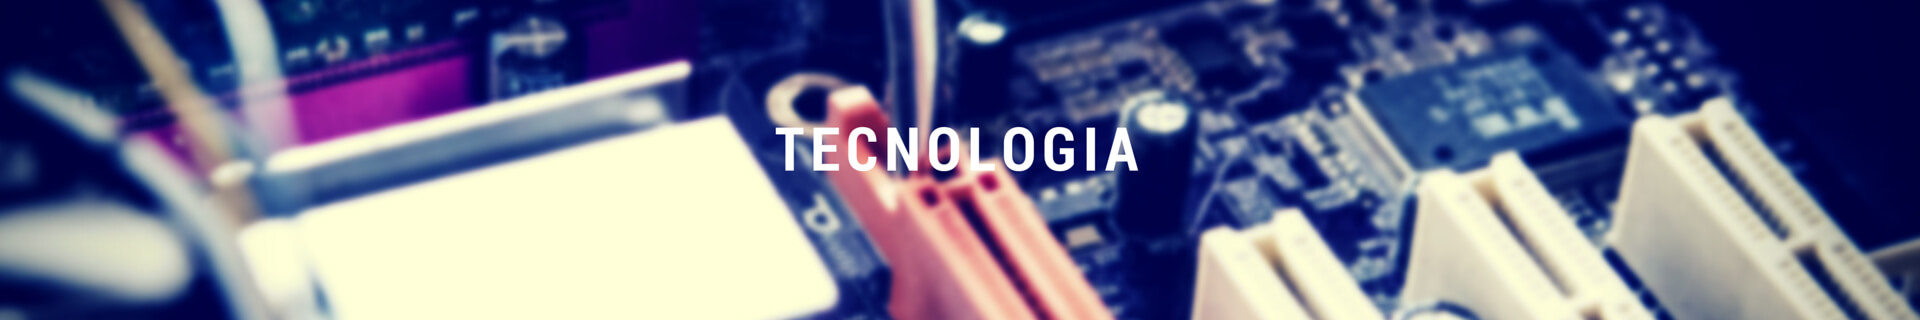 slider-tecnologia